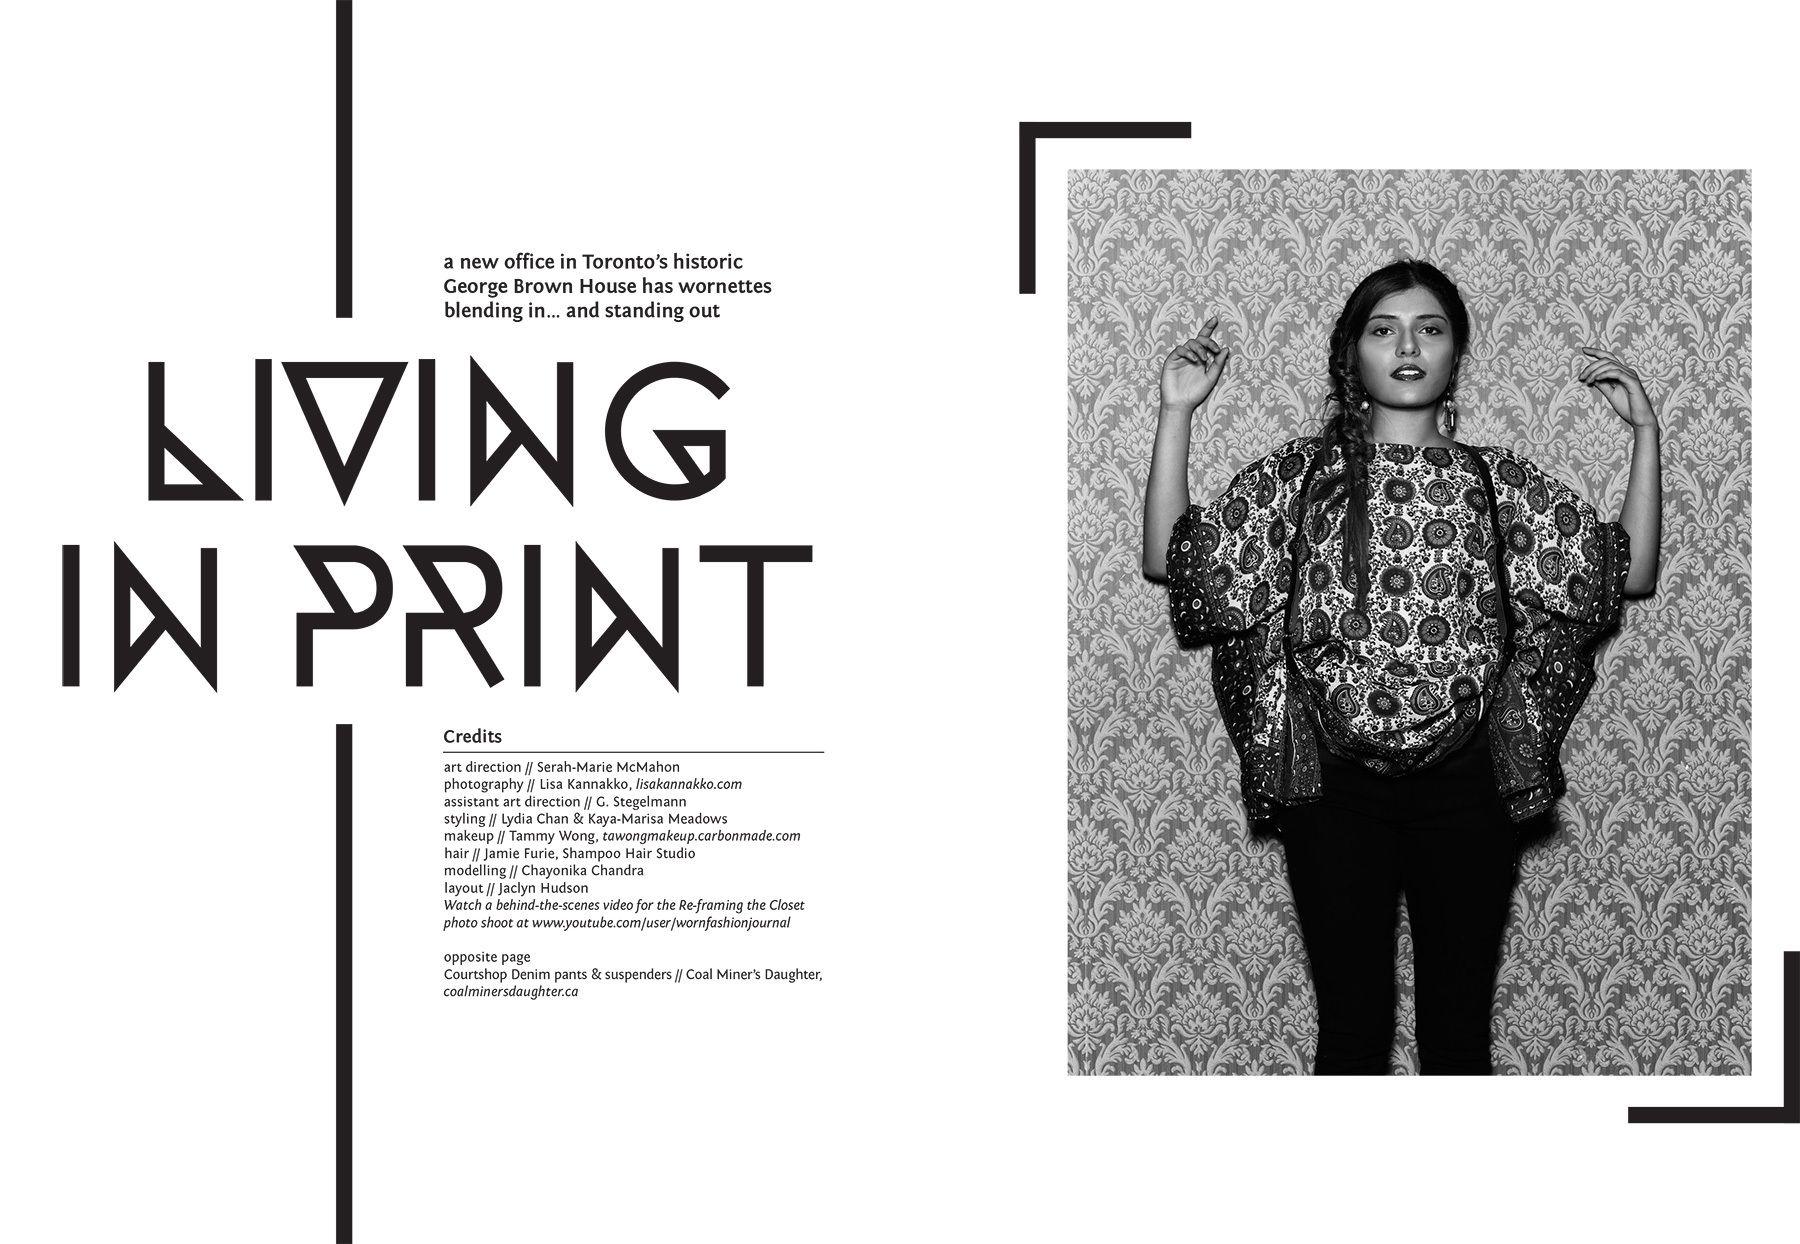 1livinginprint_issue16_1